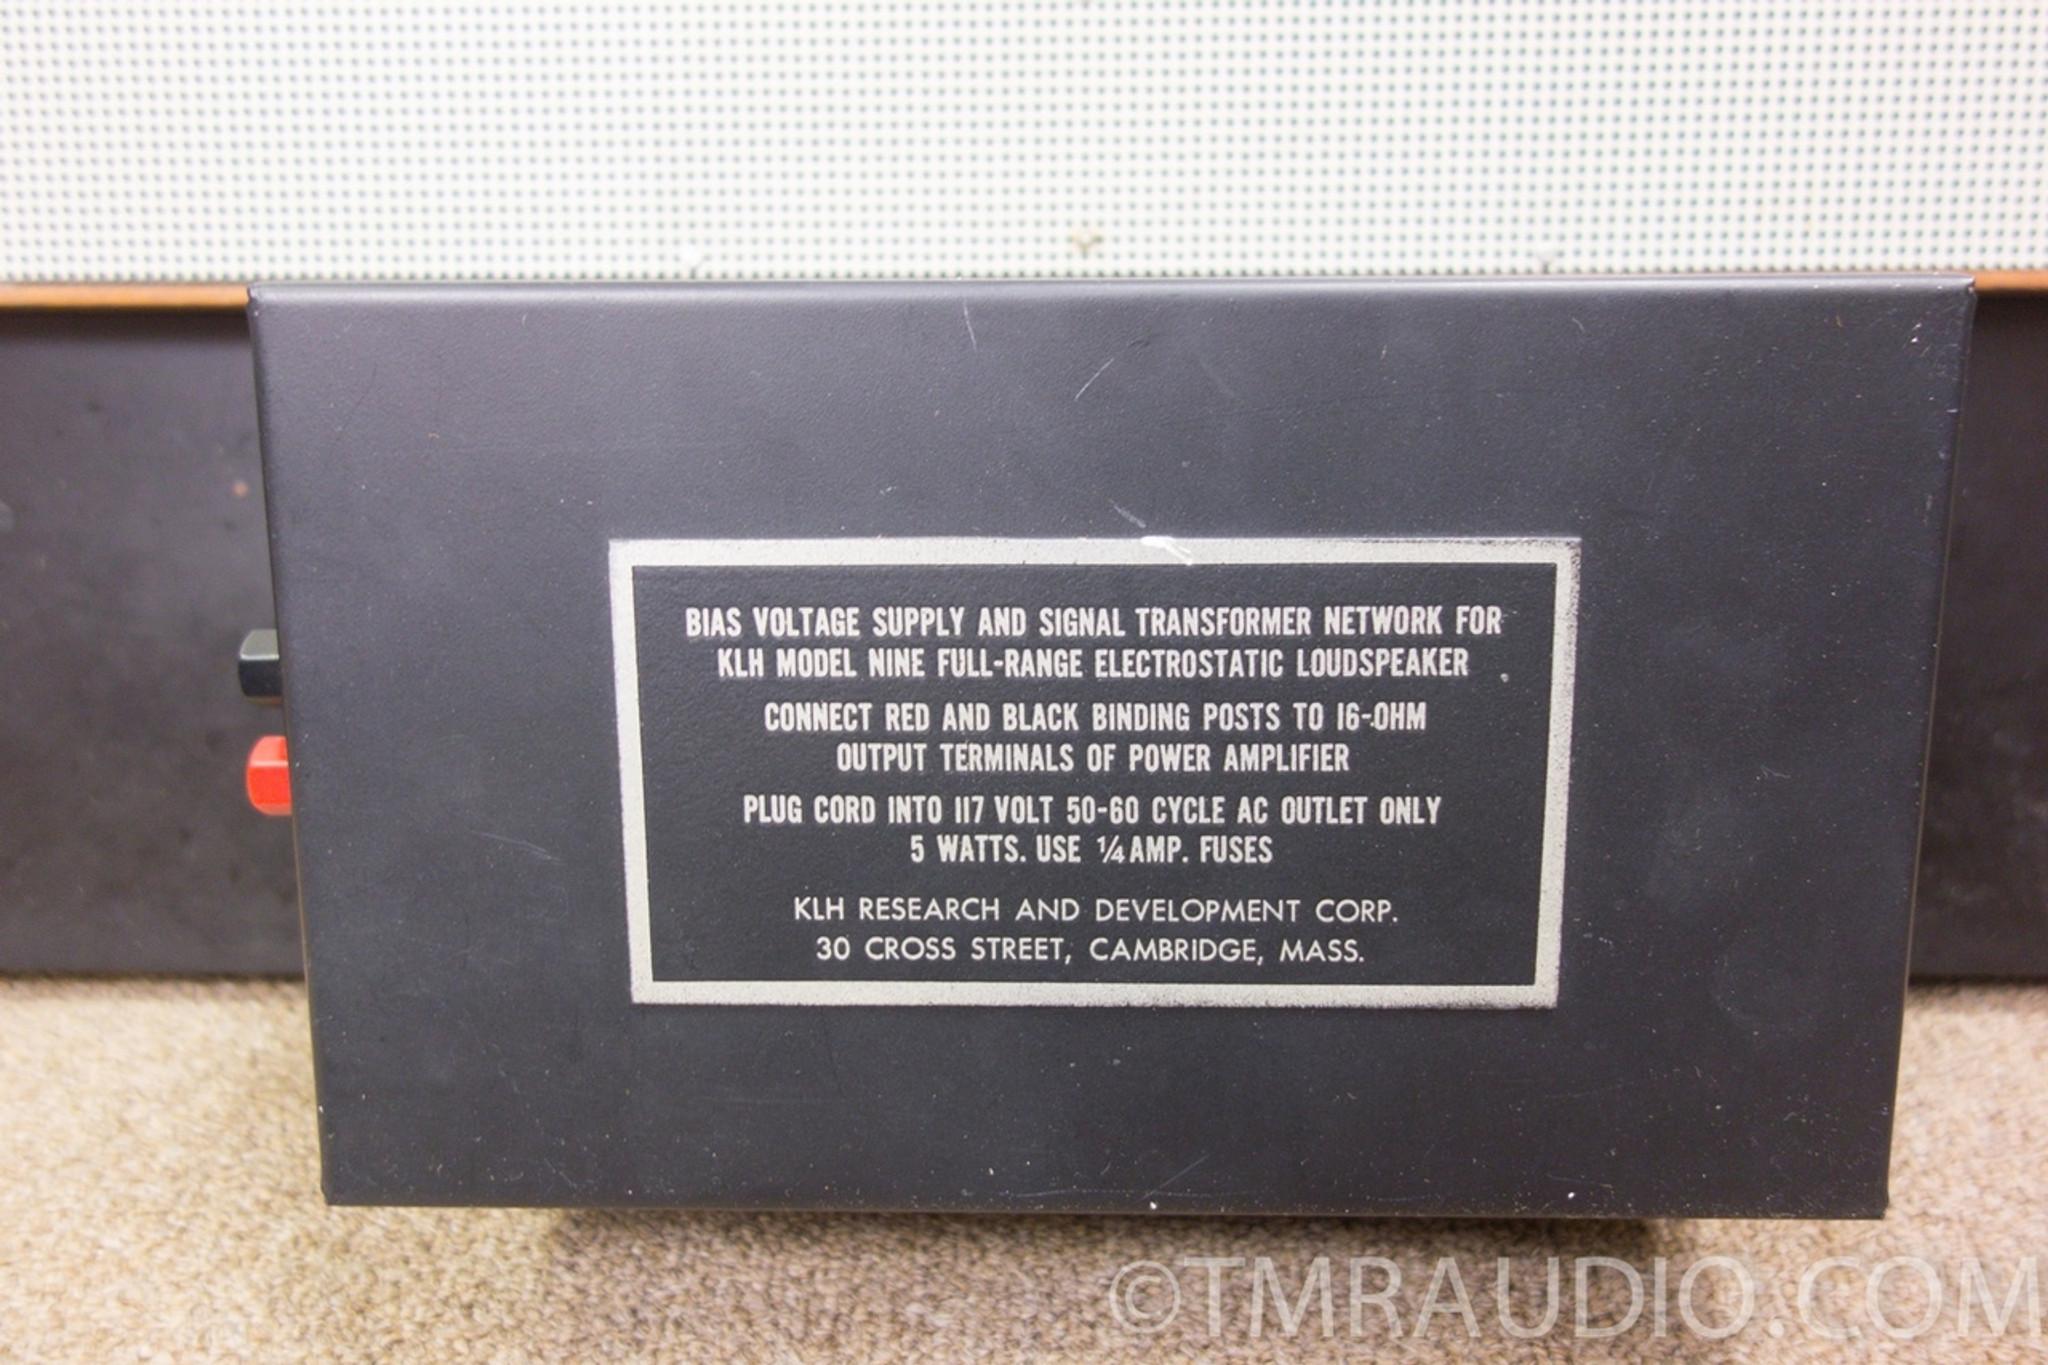 Klh Model 9 Vintage Electrostatic Speakers In Factory Box One Owner 60 Amp Fuse Stunning